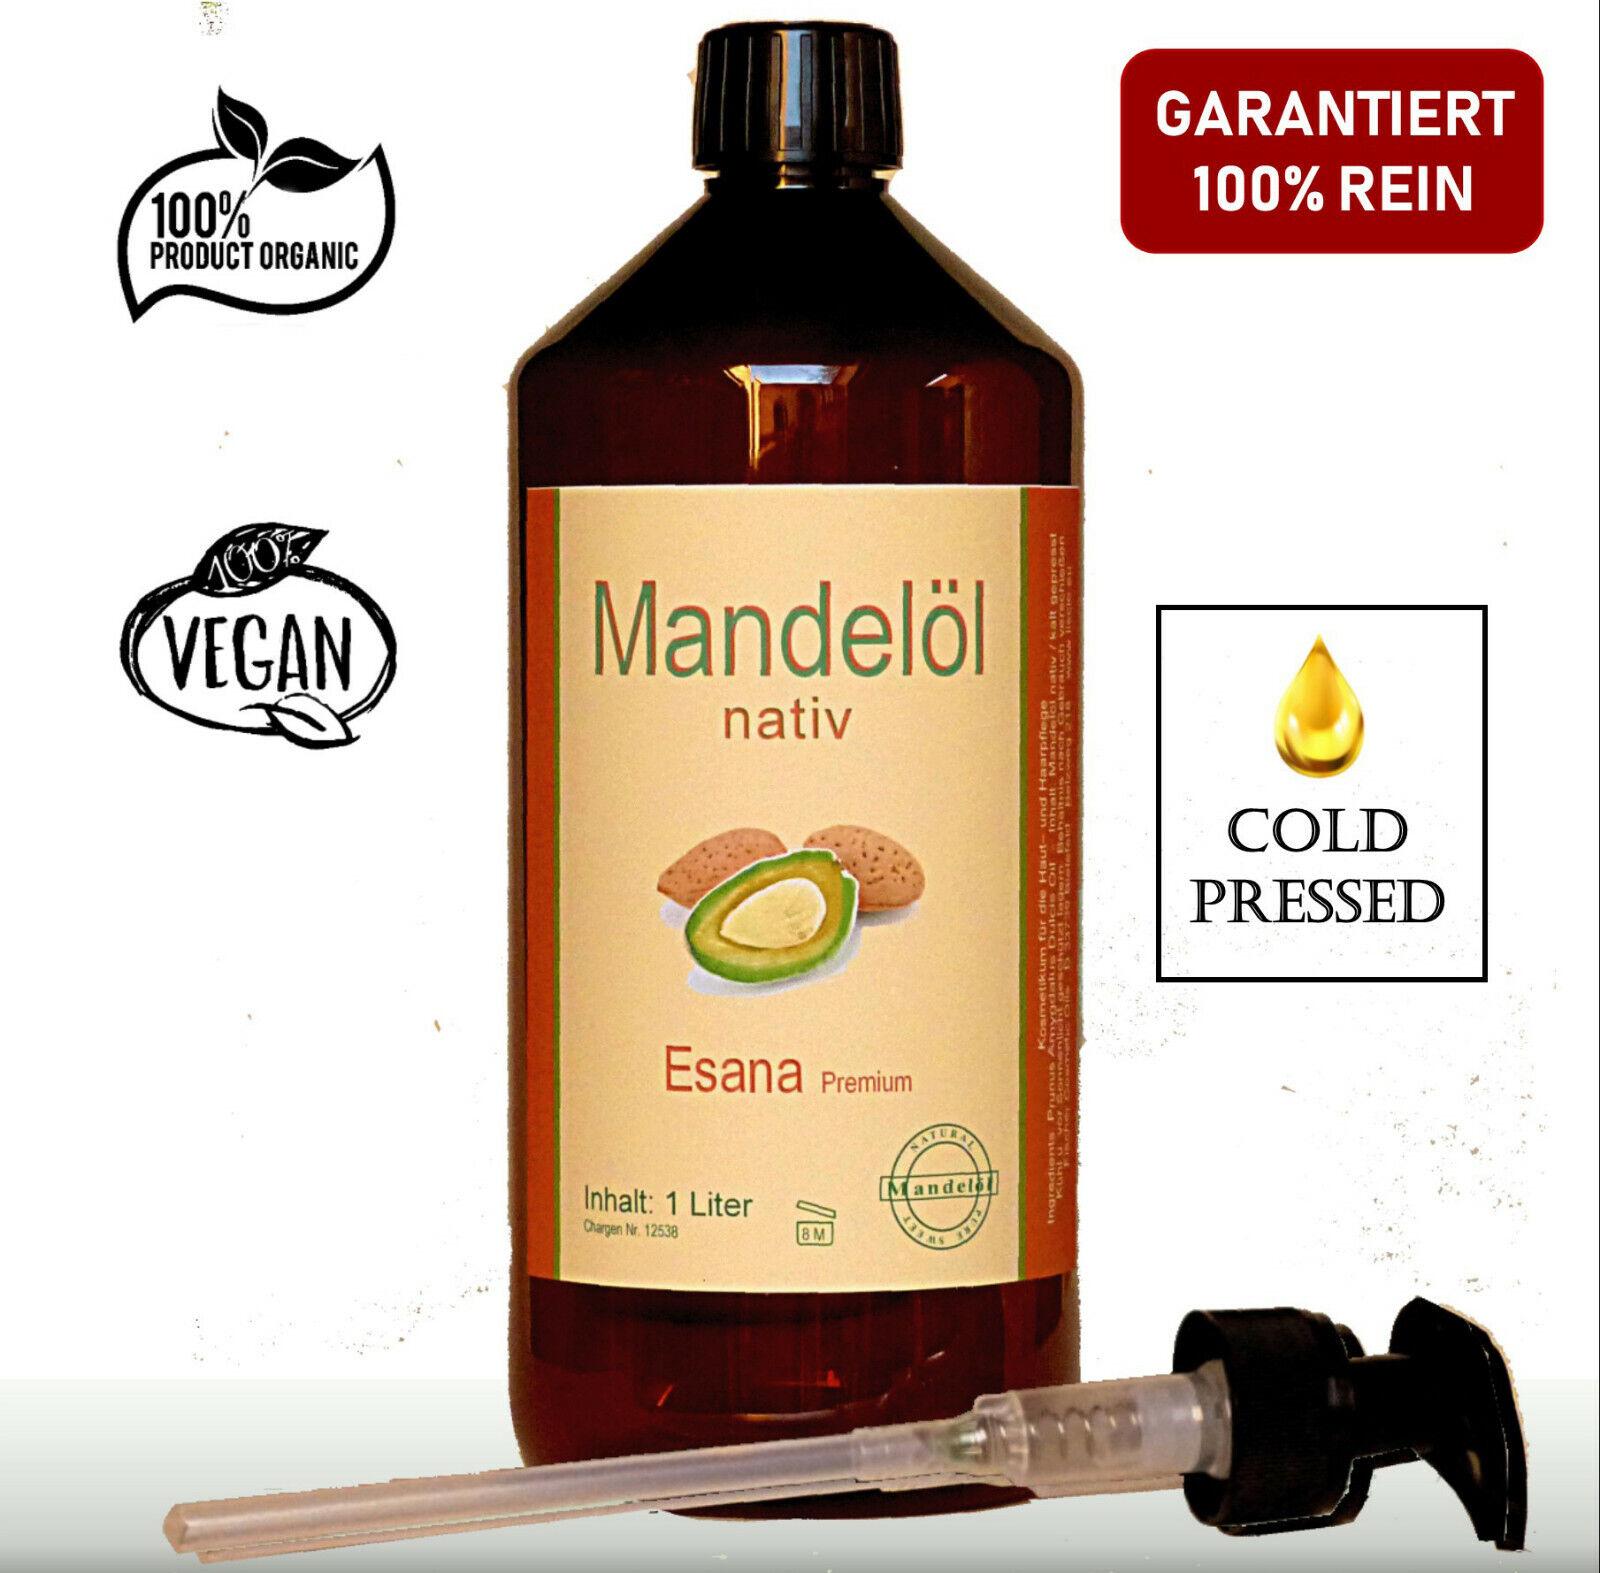 Mandelöl 1 Liter (1000ml) nativ/kaltgepresst Qualitätsprodukt inkl. Dosierpumpe